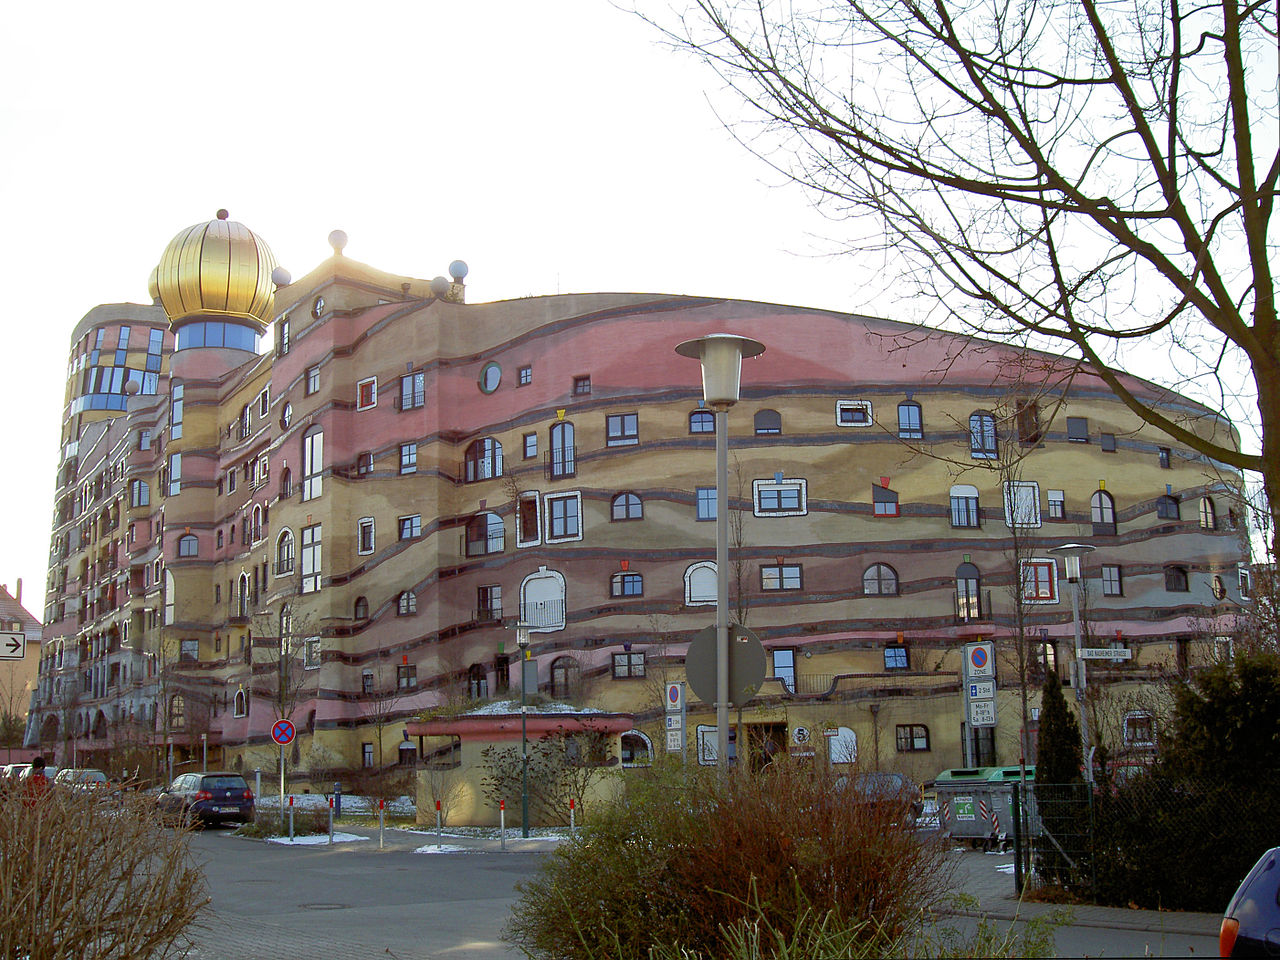 http://upload.wikimedia.org/wikipedia/commons/thumb/b/bd/Darmstadt-Waldspirale-Hundertwasser0.jpg/1280px-Darmstadt-Waldspirale-Hundertwasser0.jpg